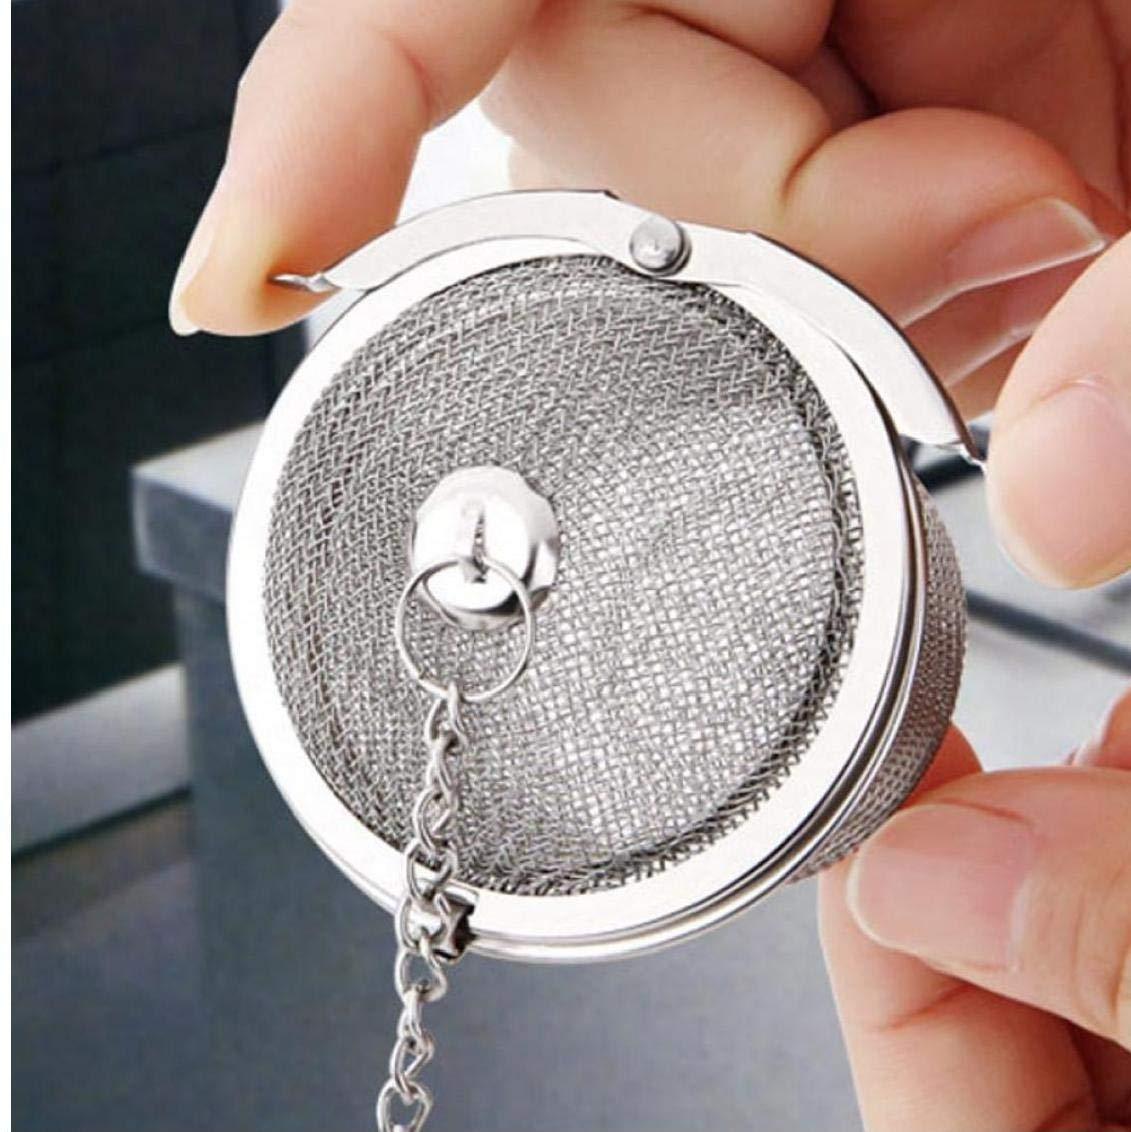 Cabilock 8Pcs Infusor de Bola de T/é de Acero Inoxidable Colador de T/é de Malla Fina Difusor de Filtro de T/é Infusor de Cocina para Hojas de Hojas Sueltas Condimento Especias 5 Cm